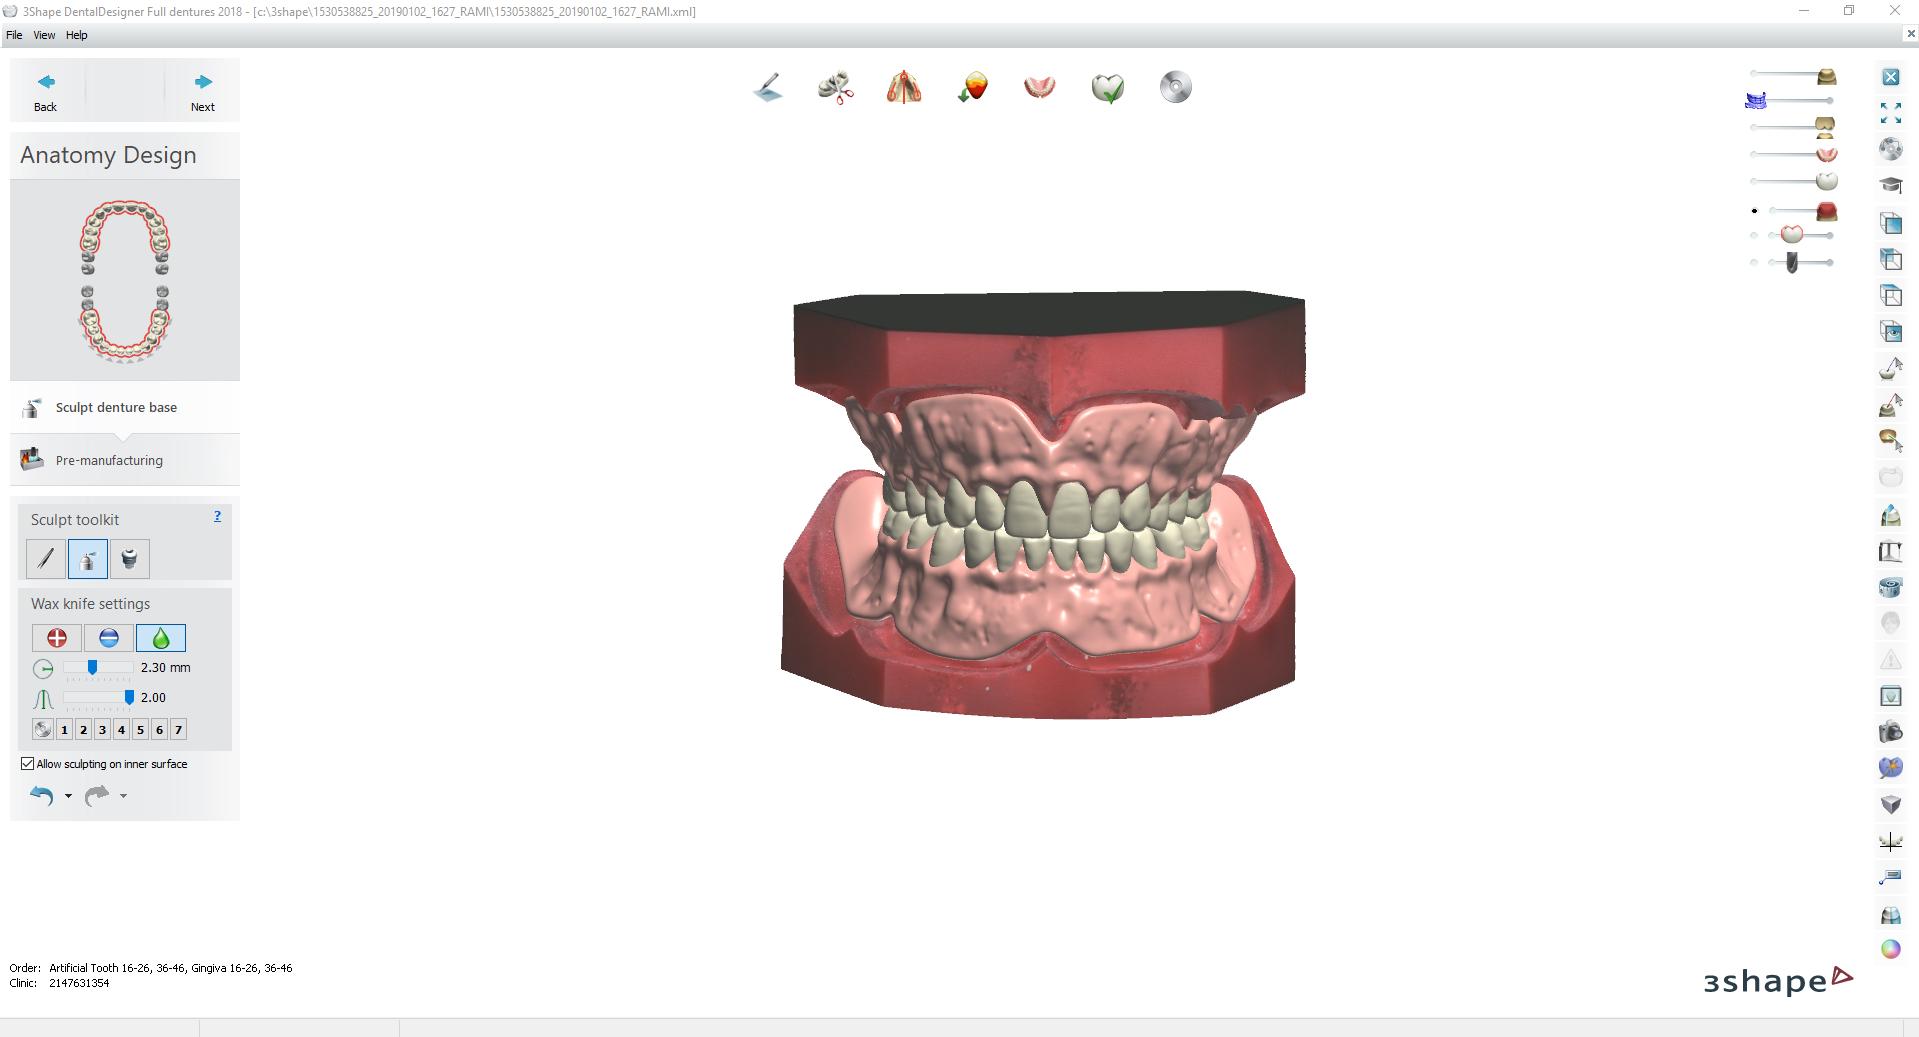 Digital Try-in Full Dentures for Injection Molding @ Pinshape